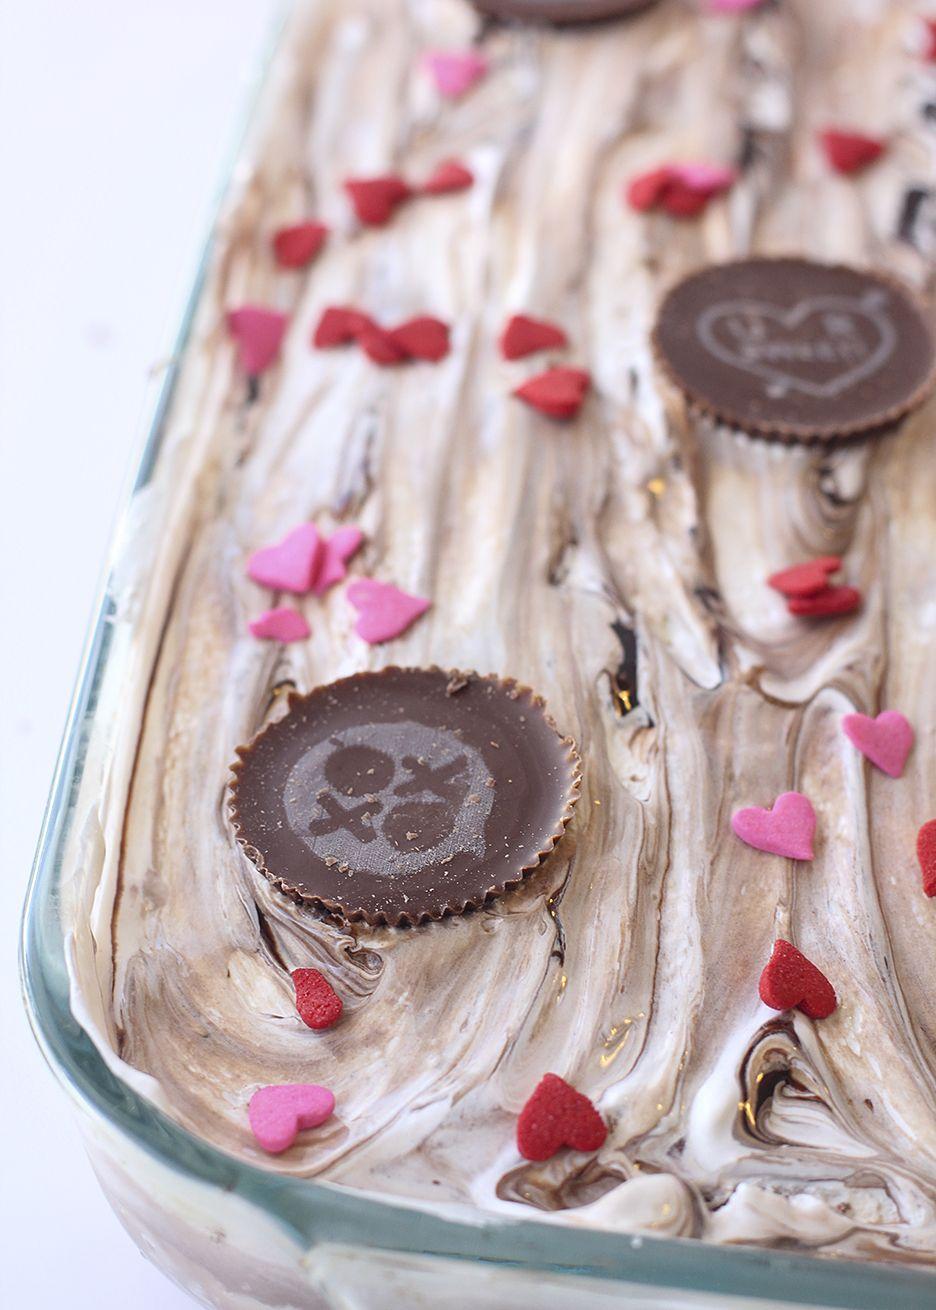 Double chocolate reeses ice cream cake yum